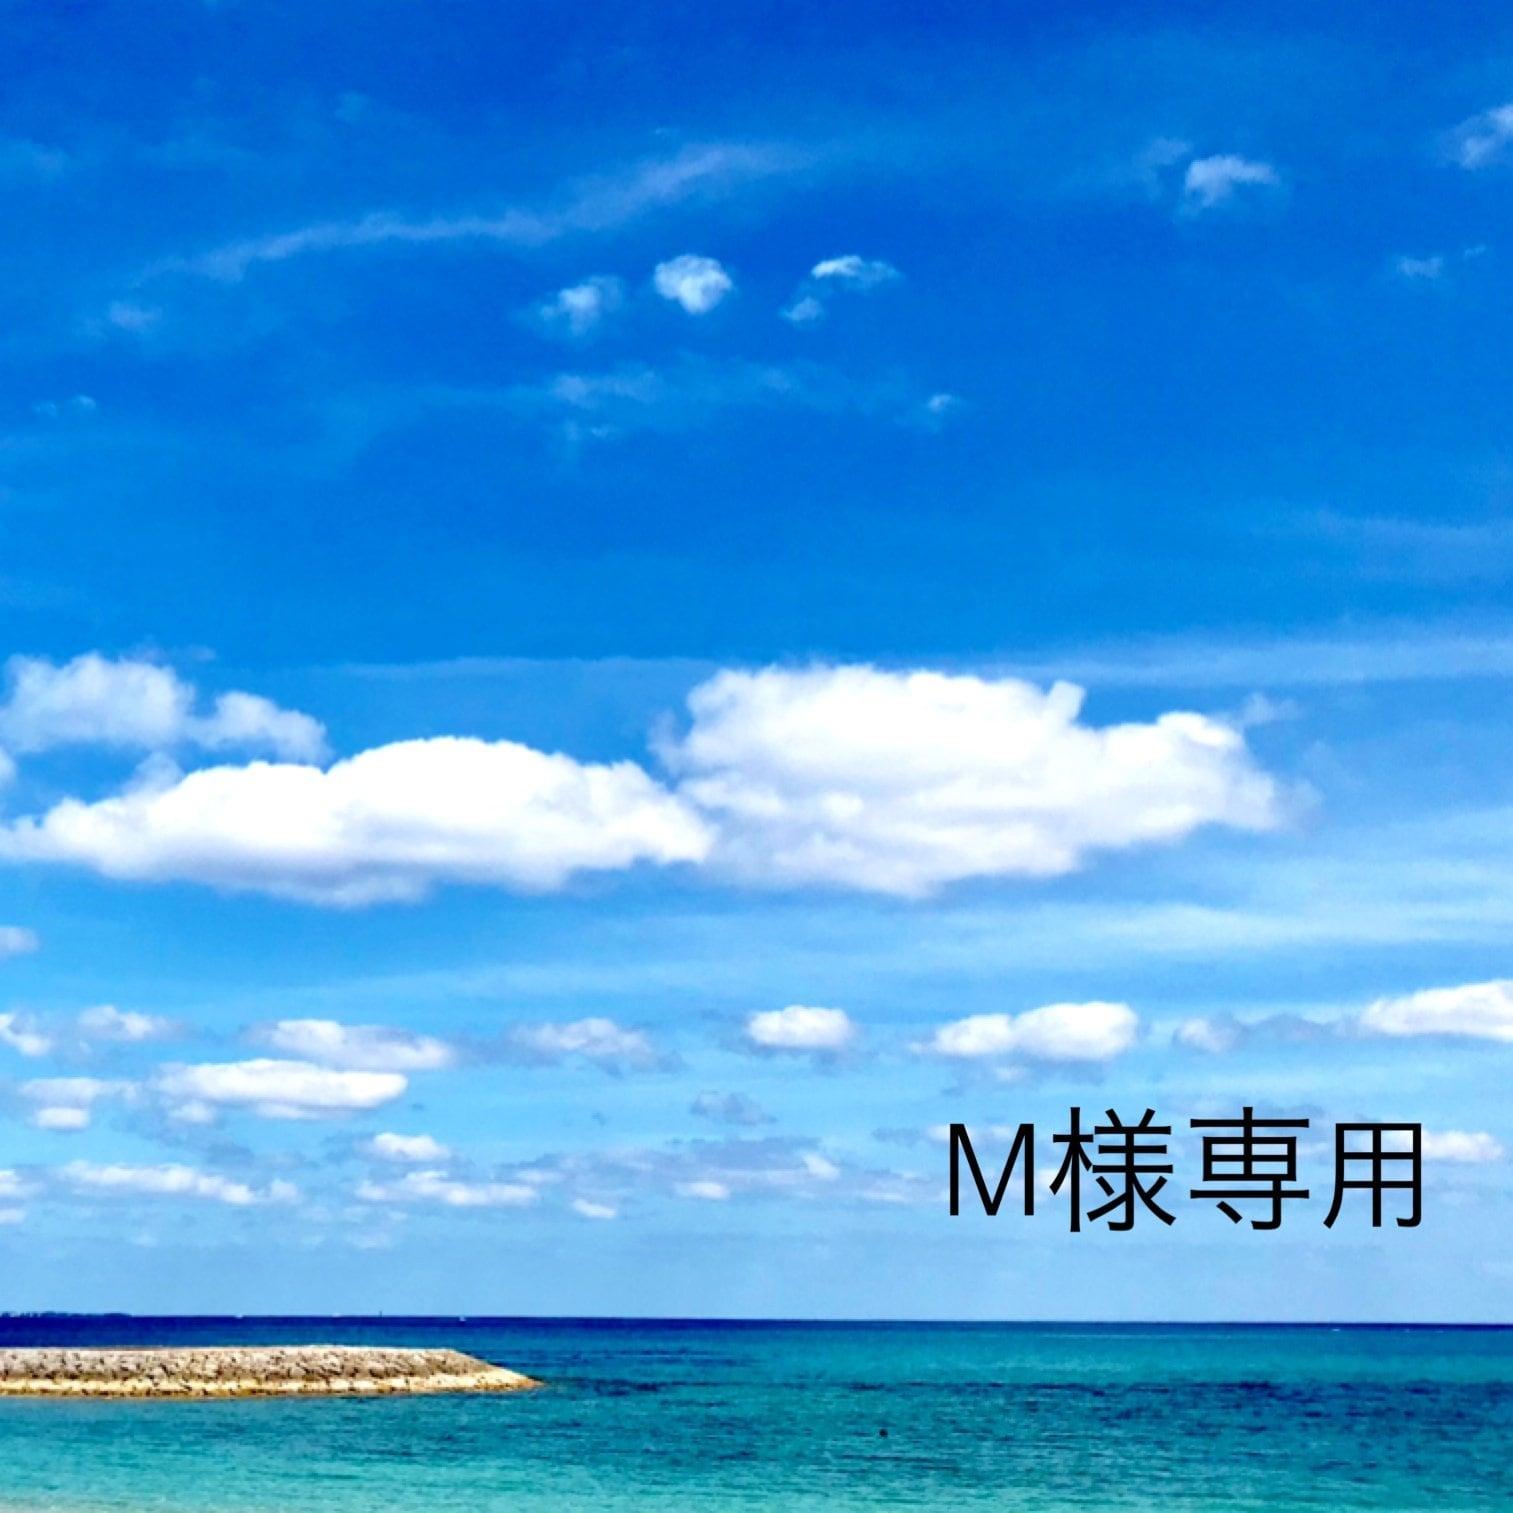 M様専用のイメージその1